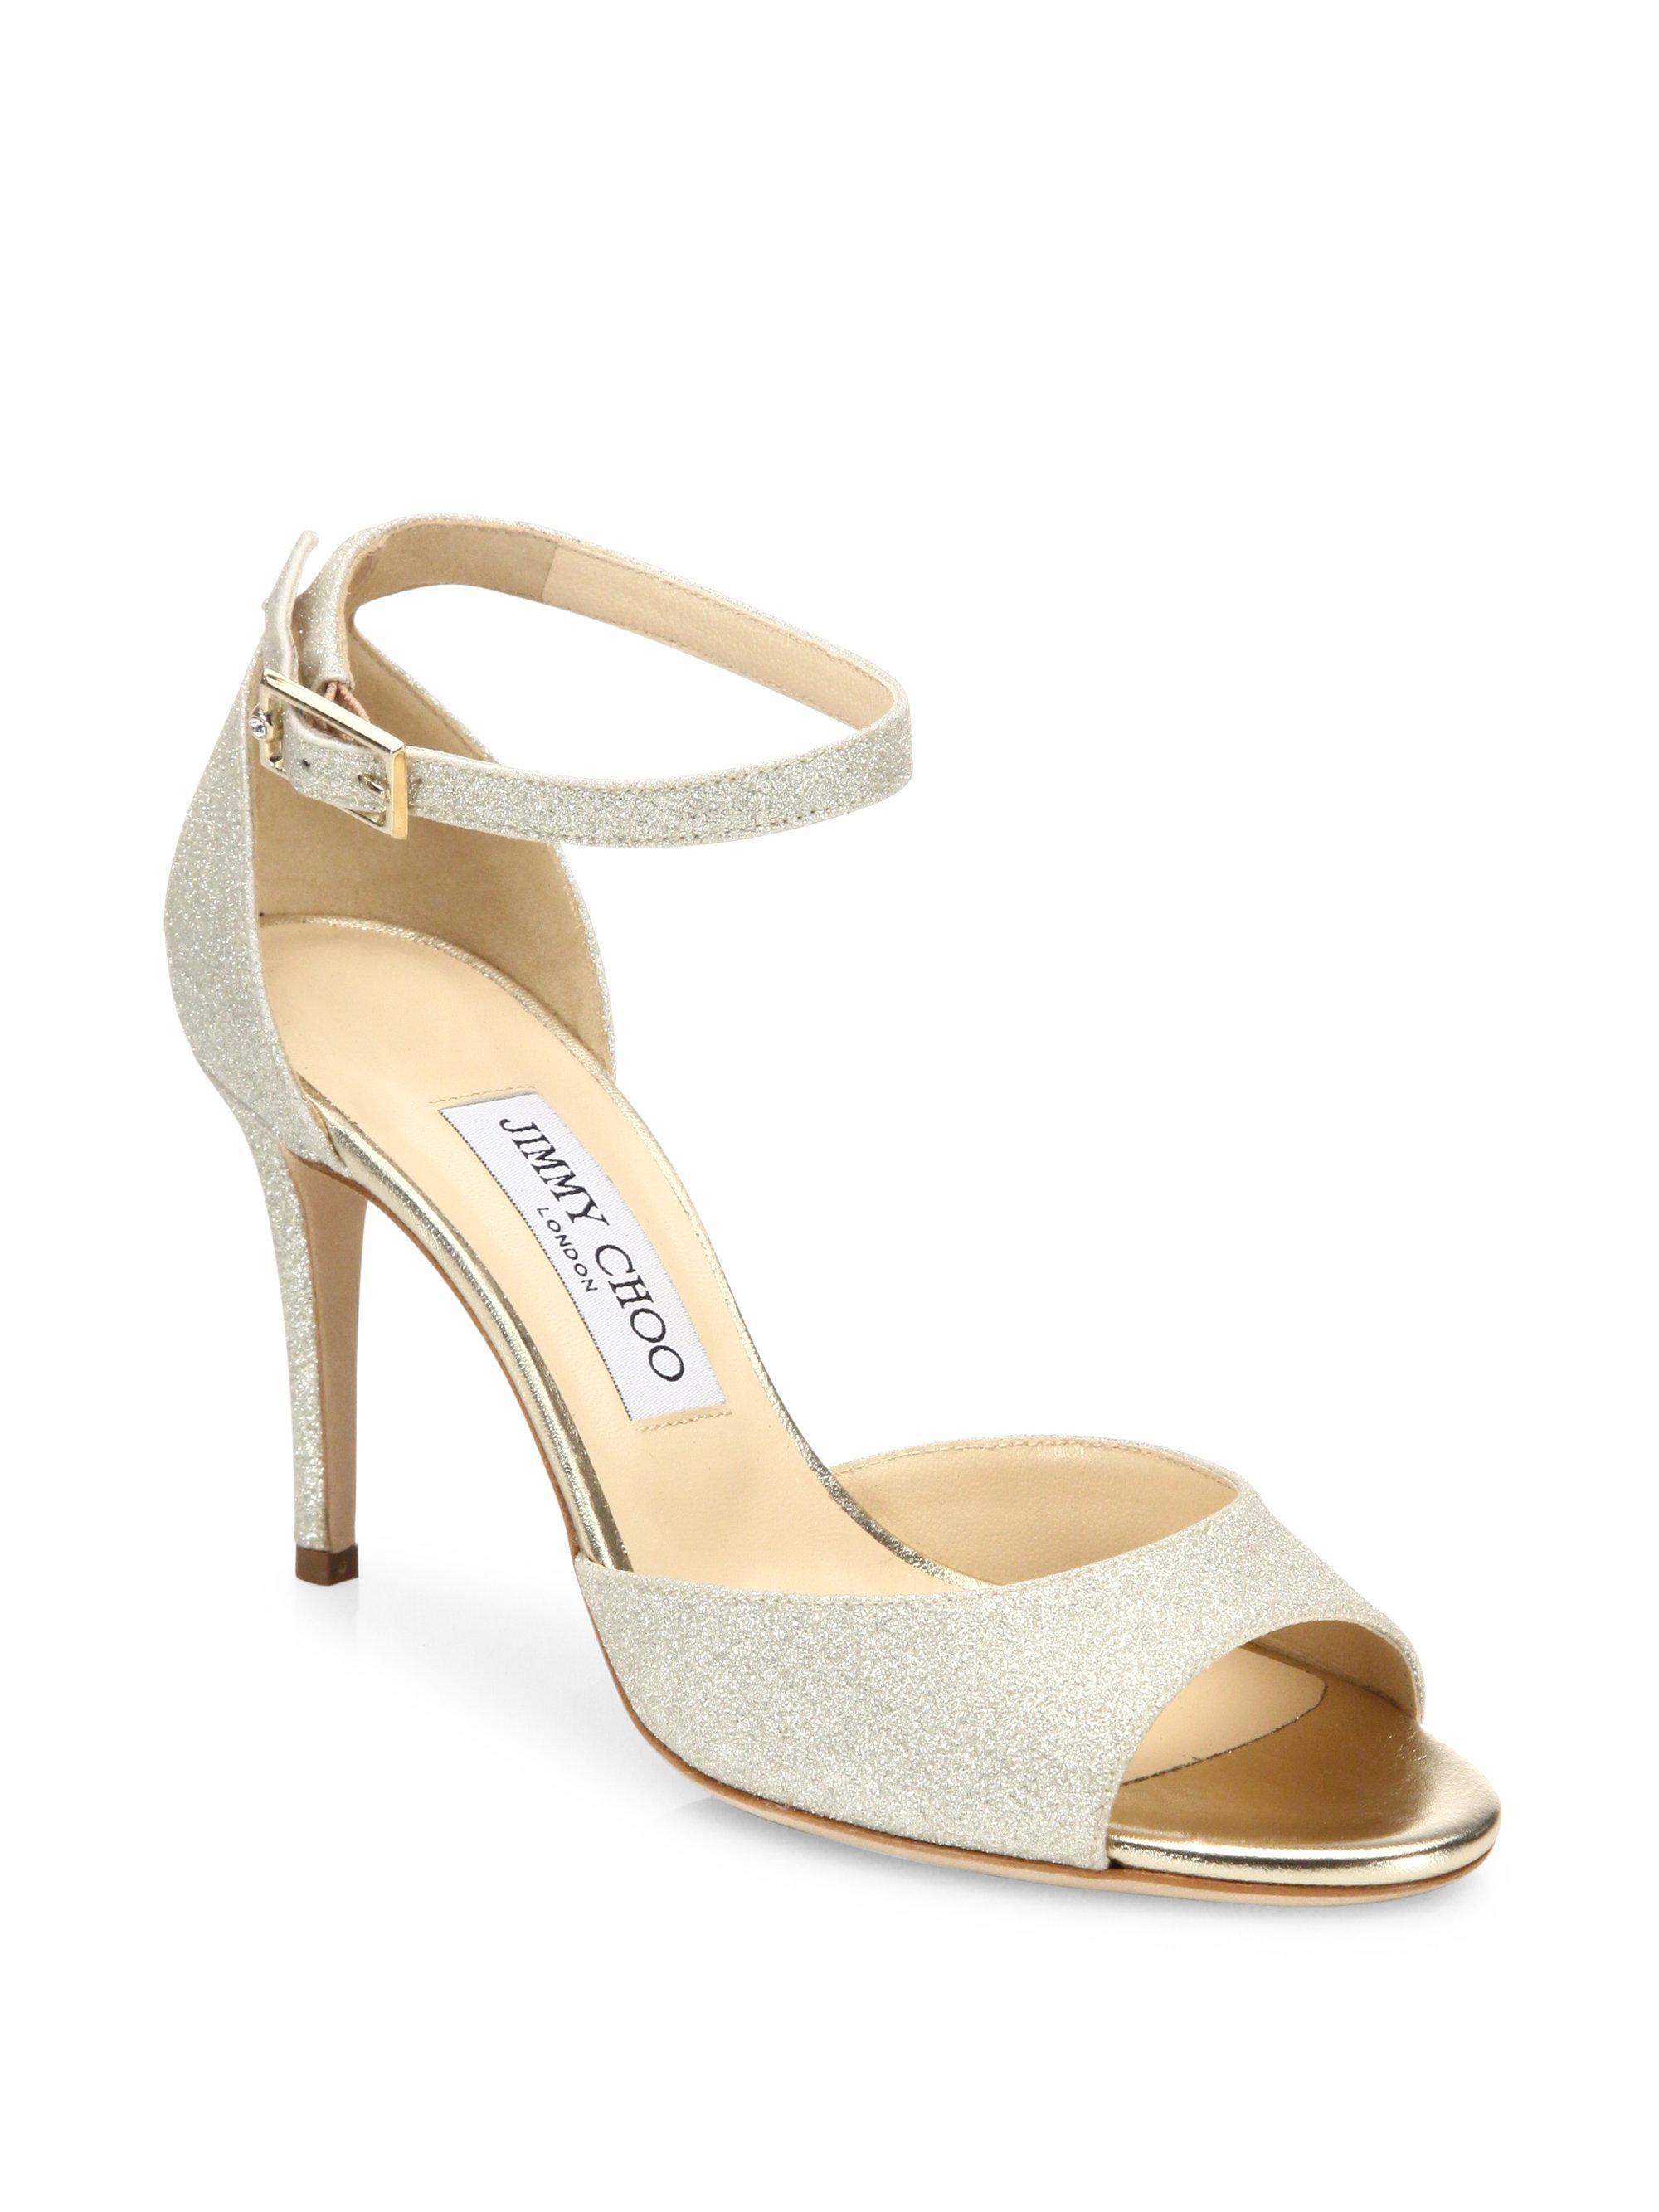 Jimmy choo Women's Annie 85 Glittered Suede High-Heel Ankle Strap Sandals jDK8SmvF